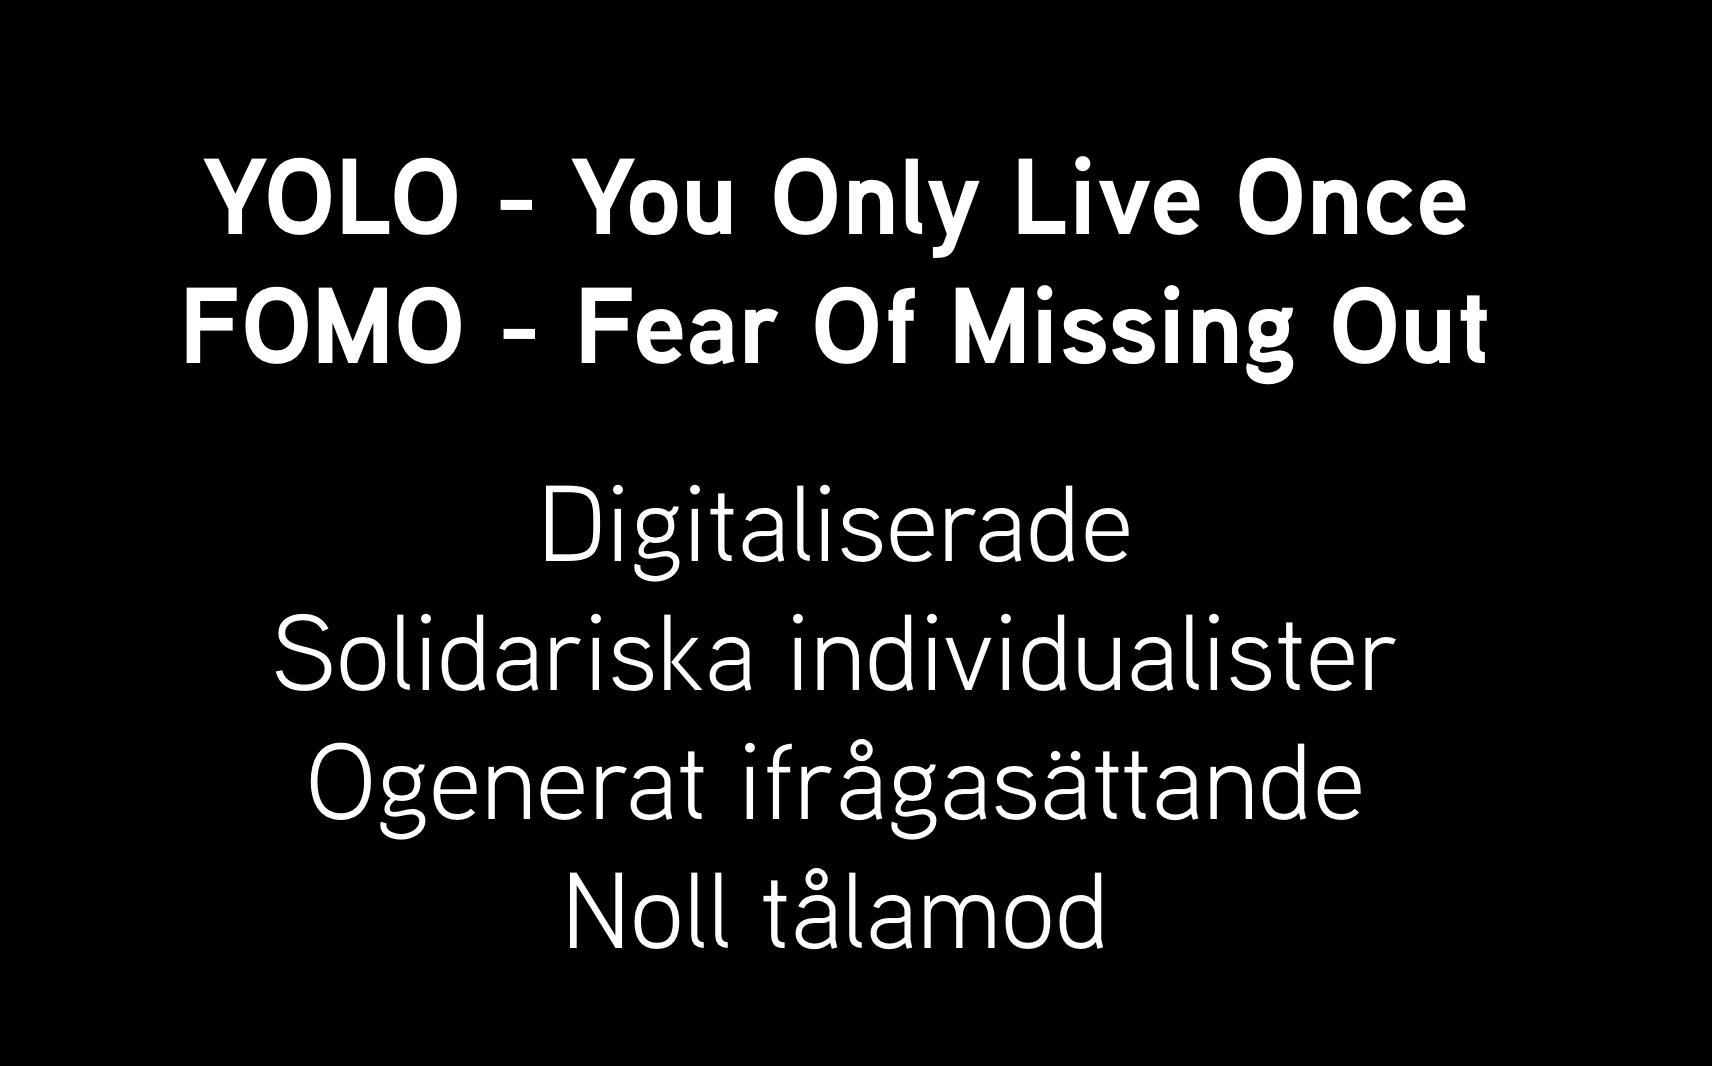 YOLO_FOMO